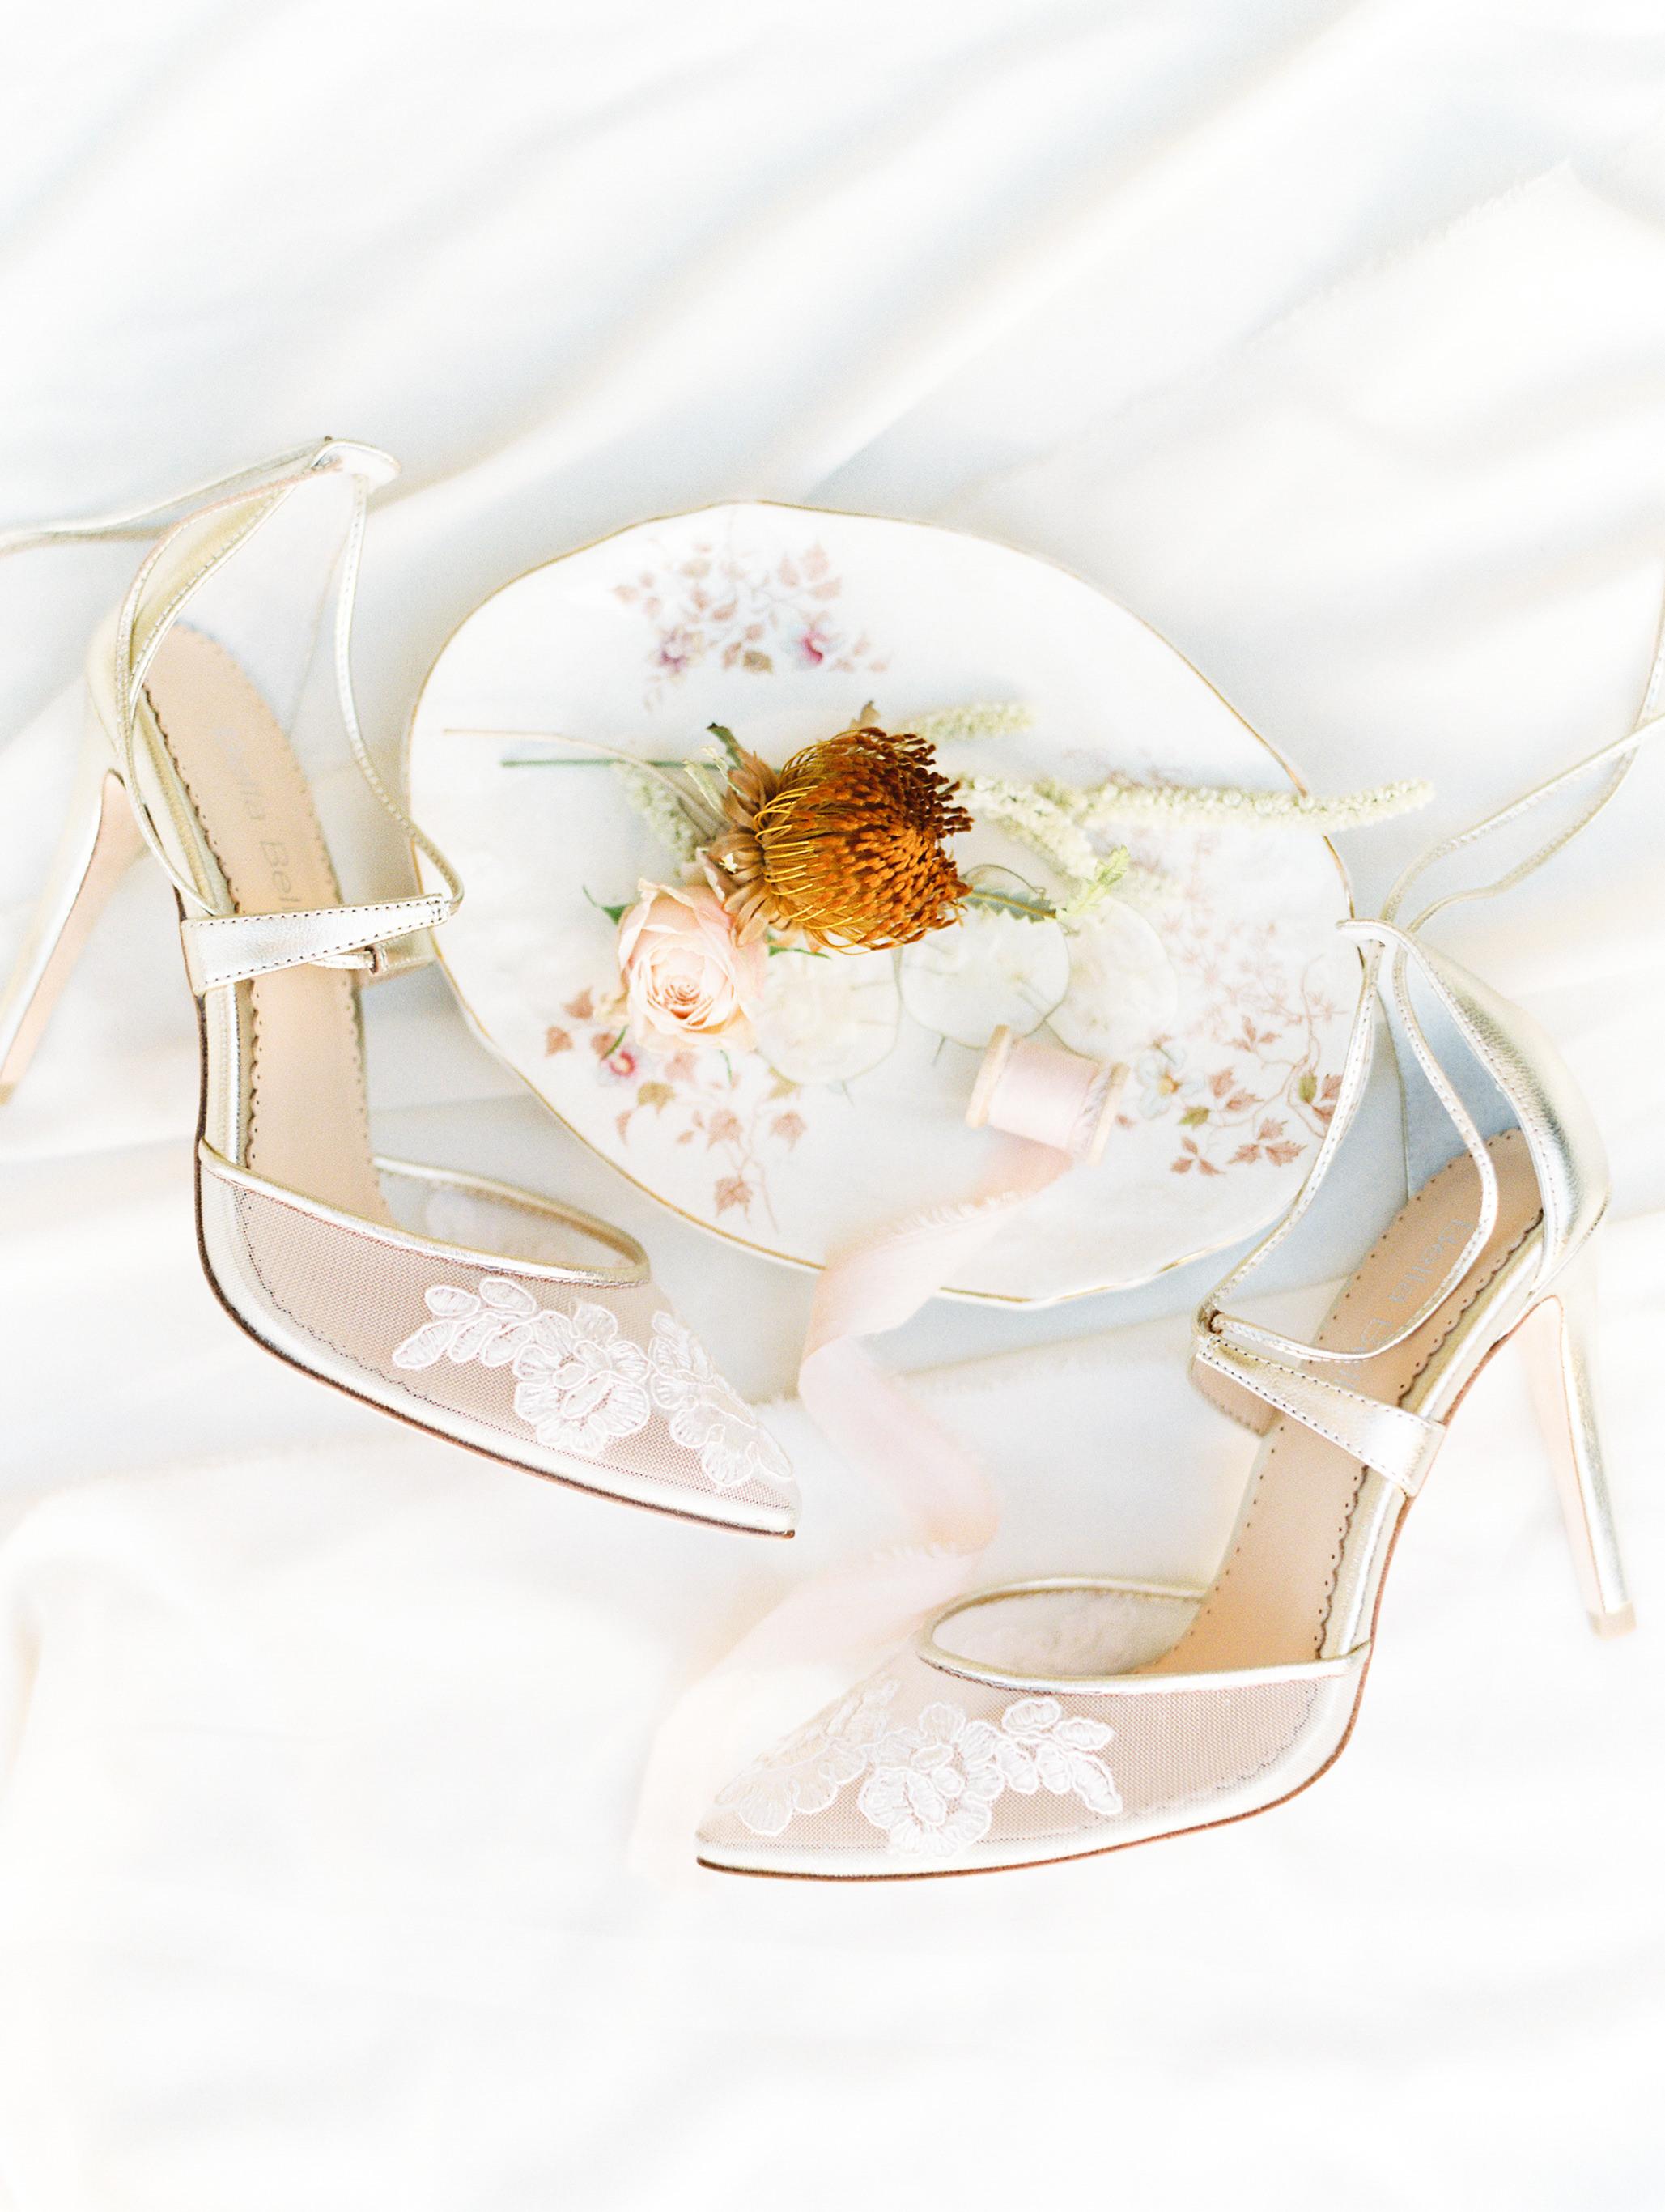 romantic-italy-wedding-in-tuscany-29.jpg